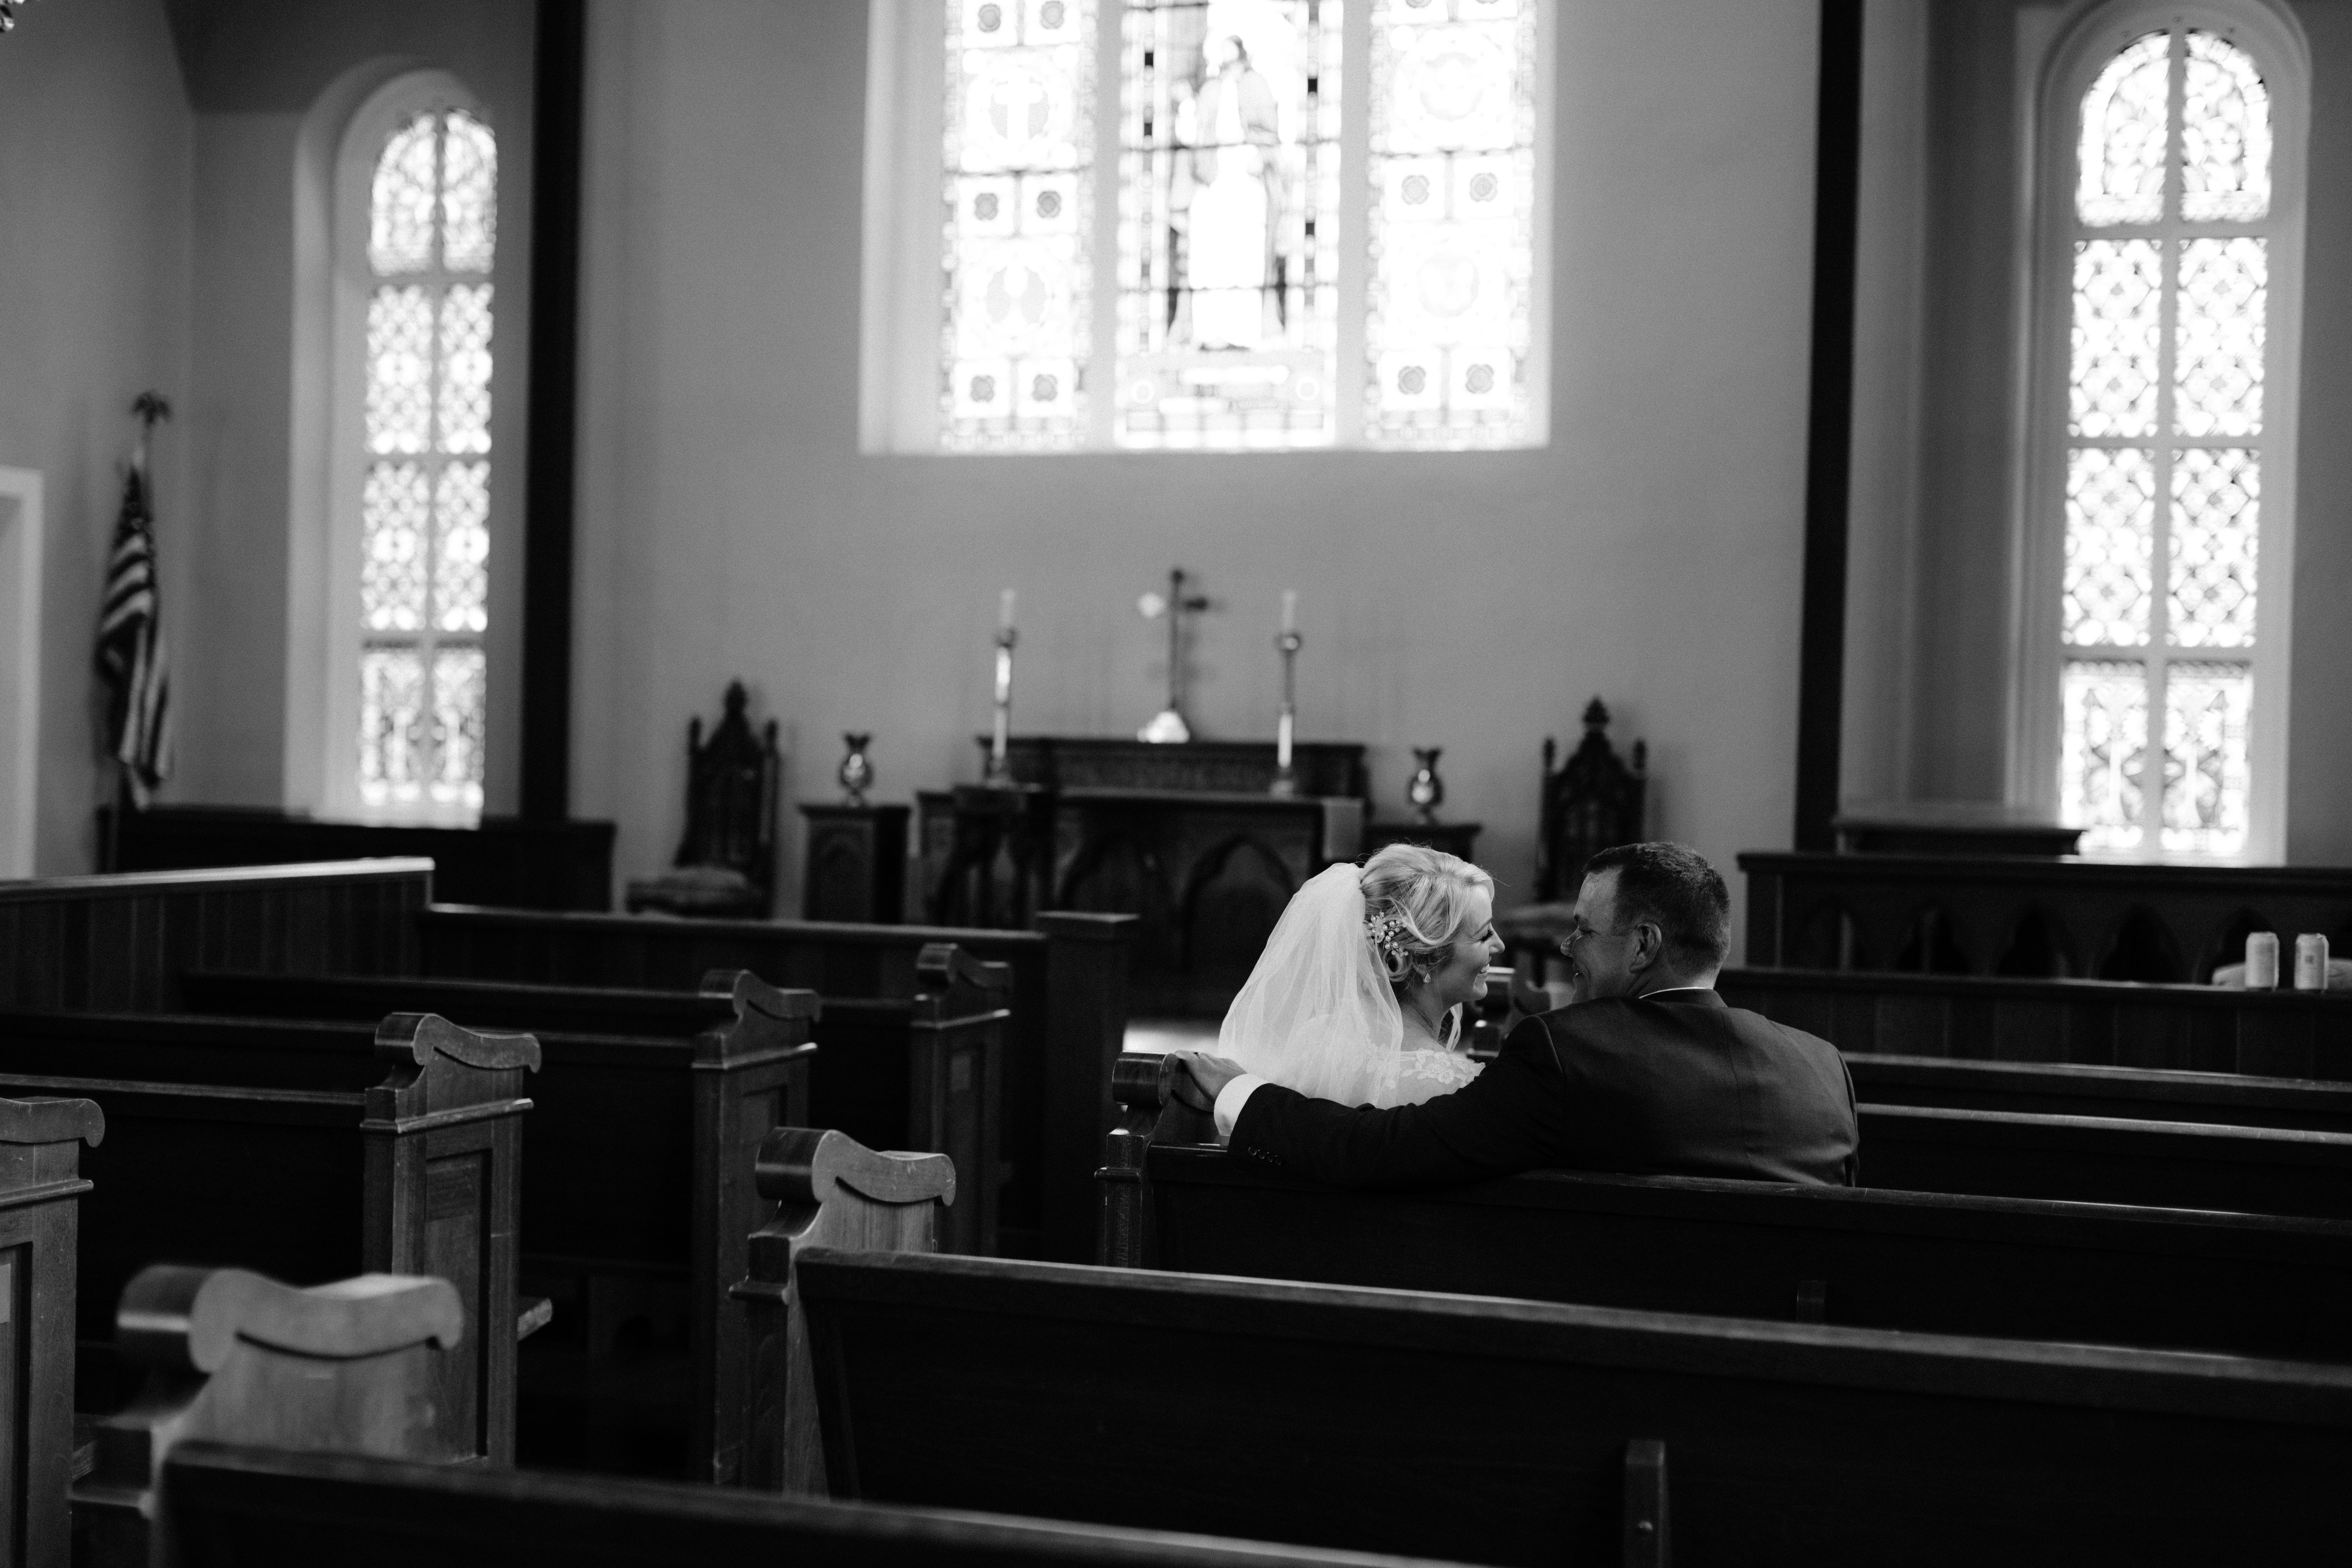 How To Have An Interfaith Wedding